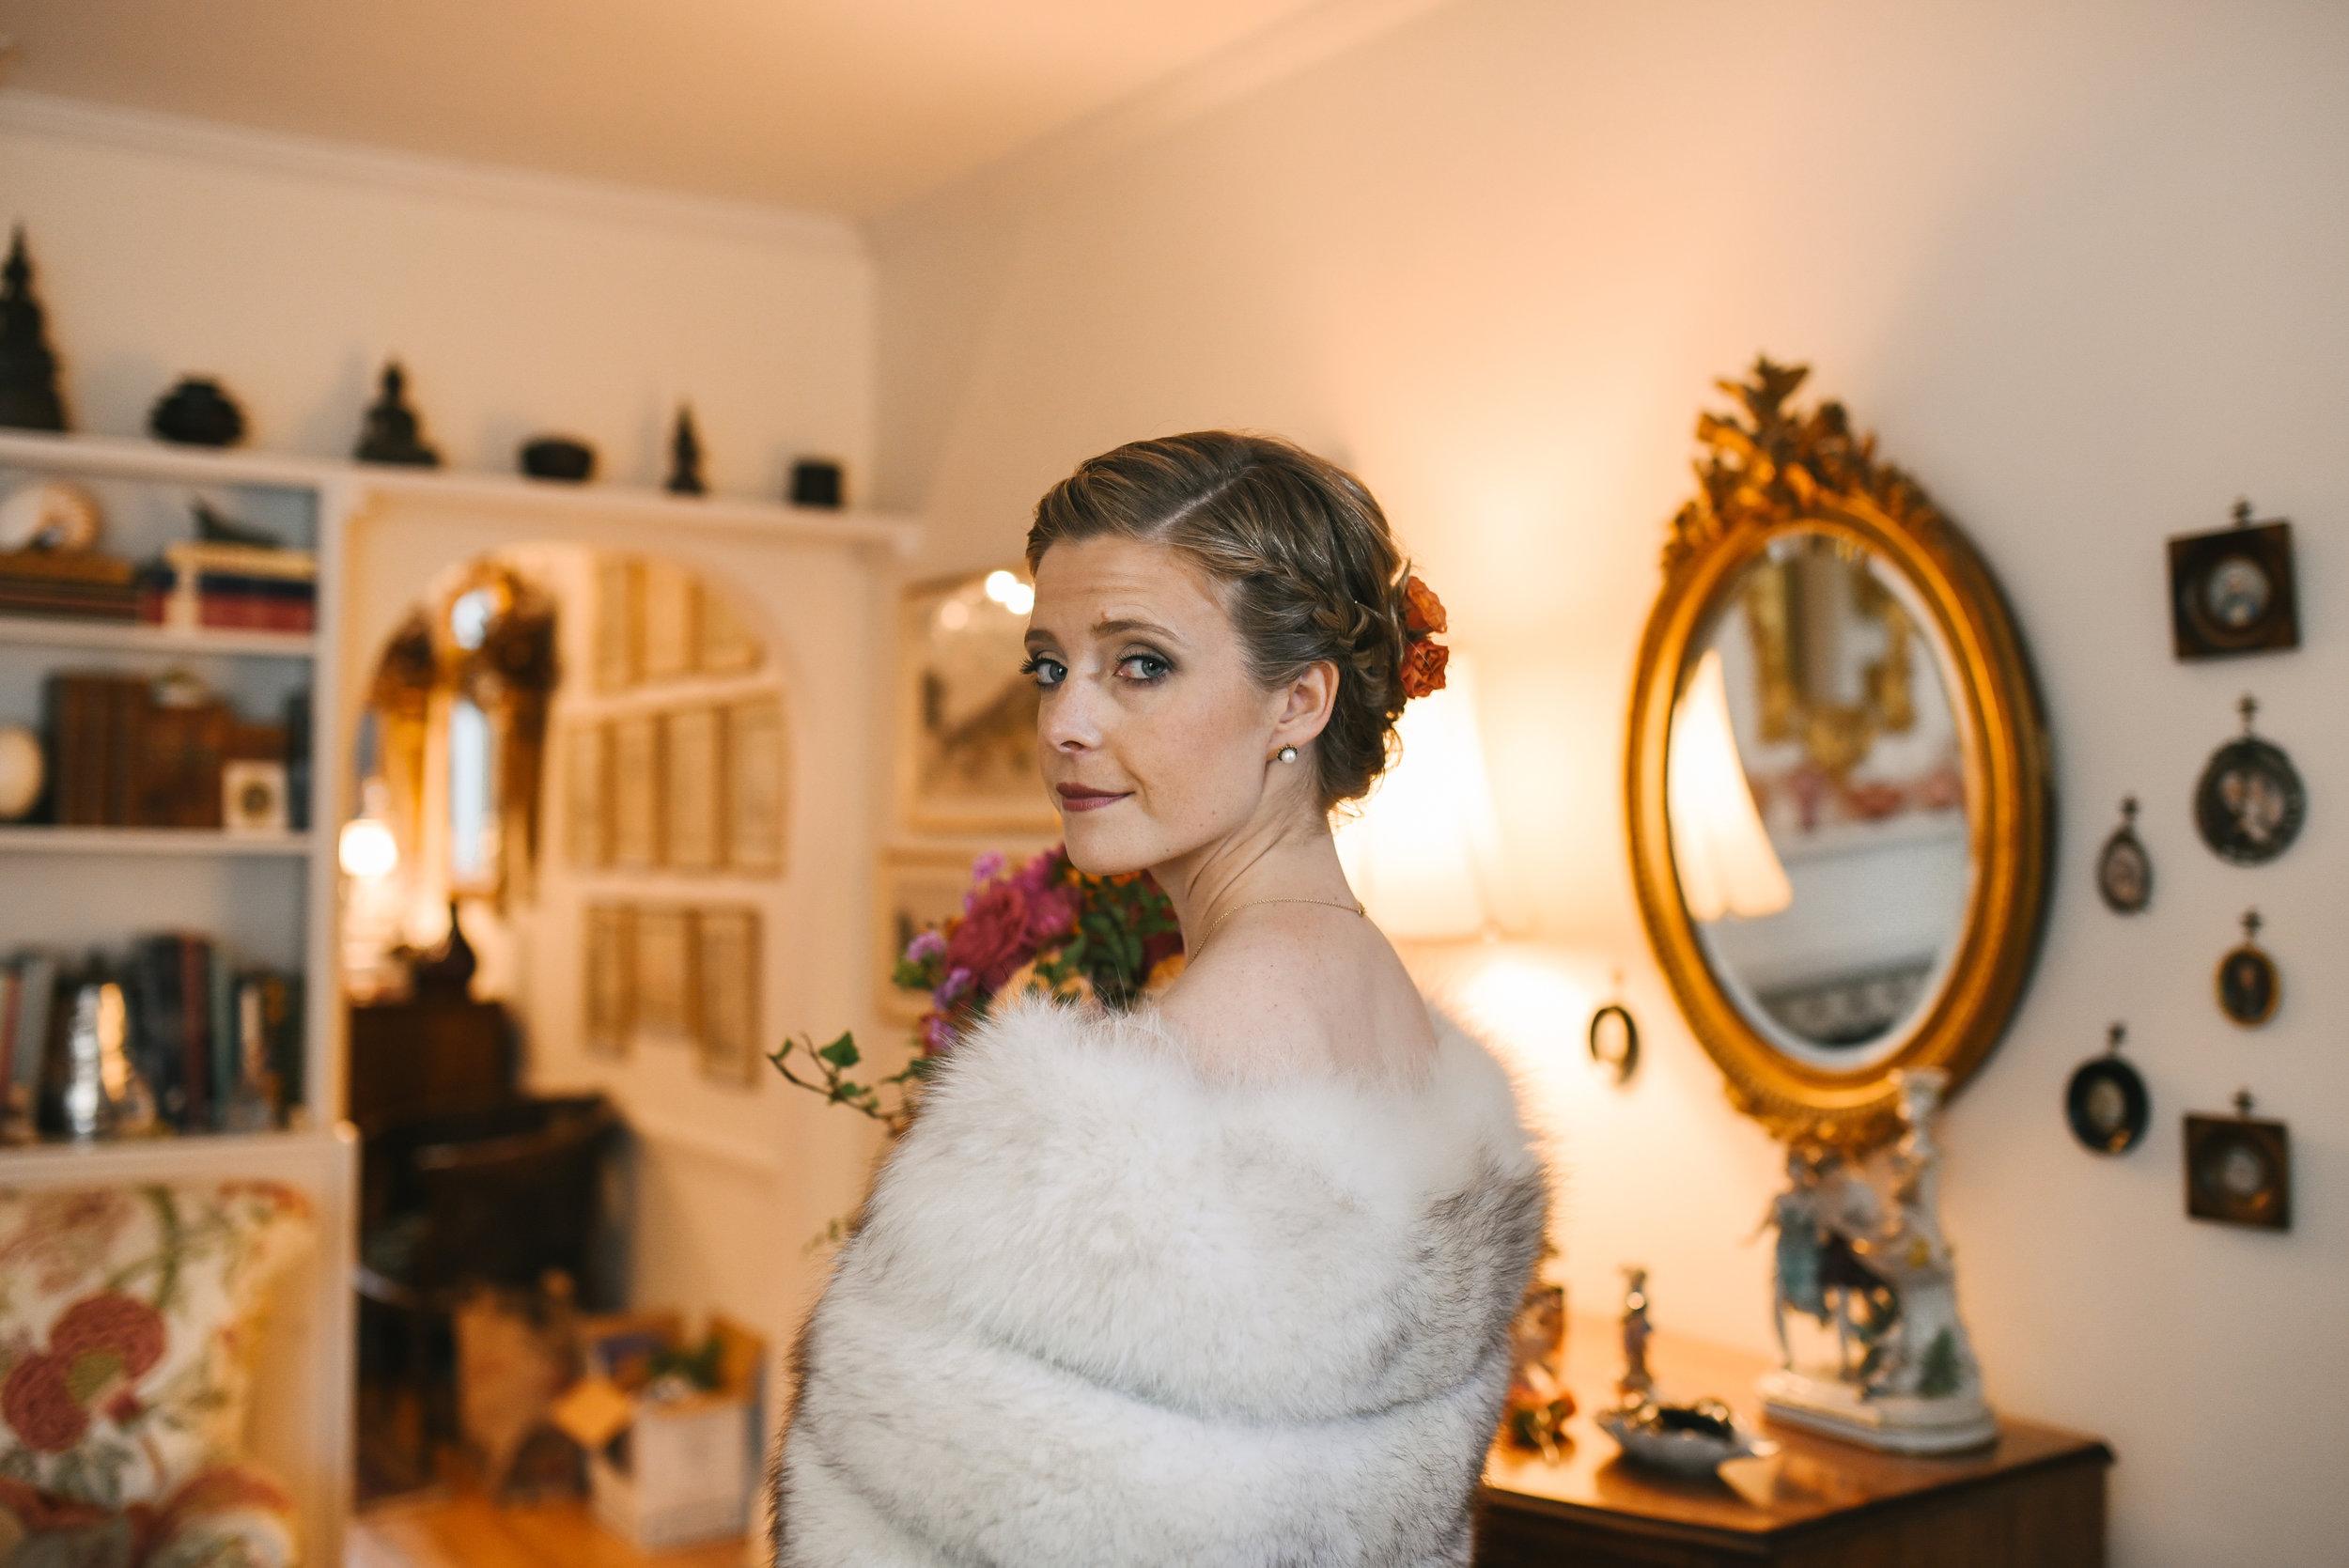 Alexandria, Virginia, Fall Wedding, Historic Wedding, Old Town, DC, Fur Wrap, Getting Ready, Rustic, Glam, The London Bob Hair Design, St. Paul's Episcopal Church